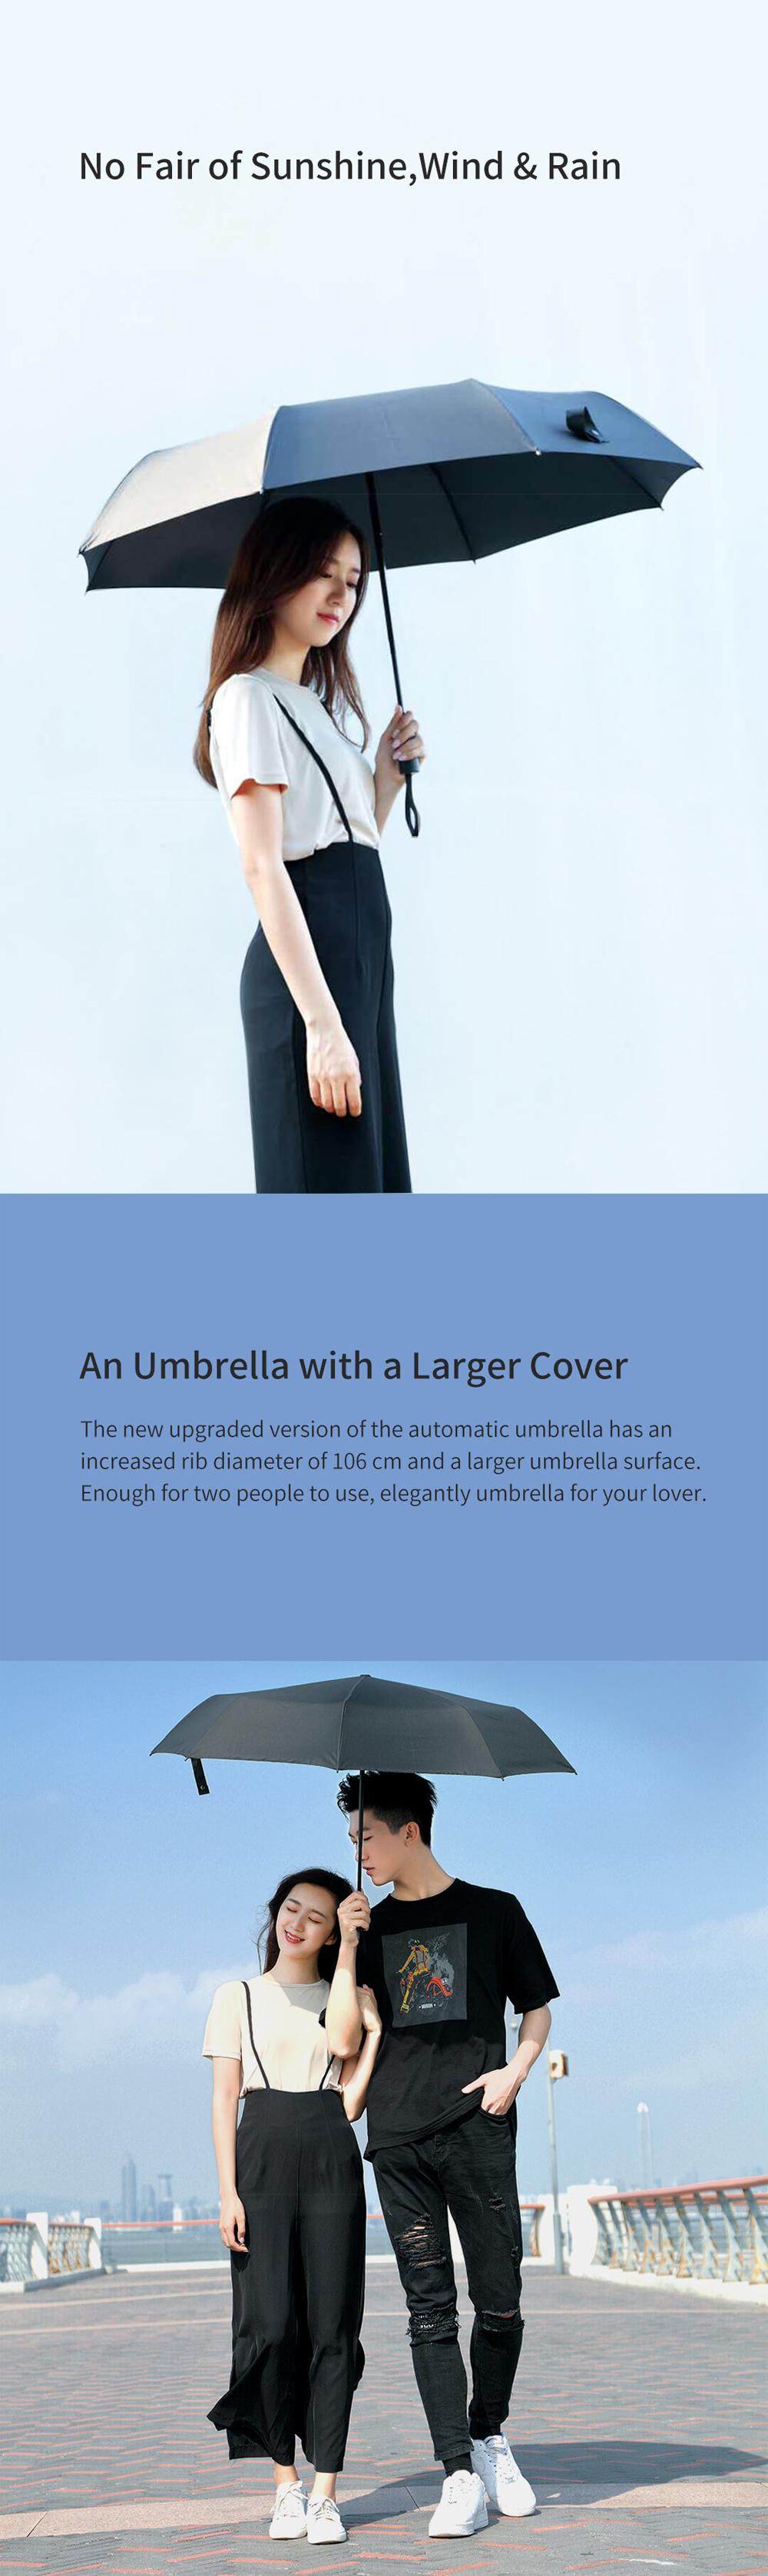 Xiaomi Mijia Pinluo Automatic Umbrella Sunny Rainy Aluminum Windproof Waterproof UV Parasol for Man Woman